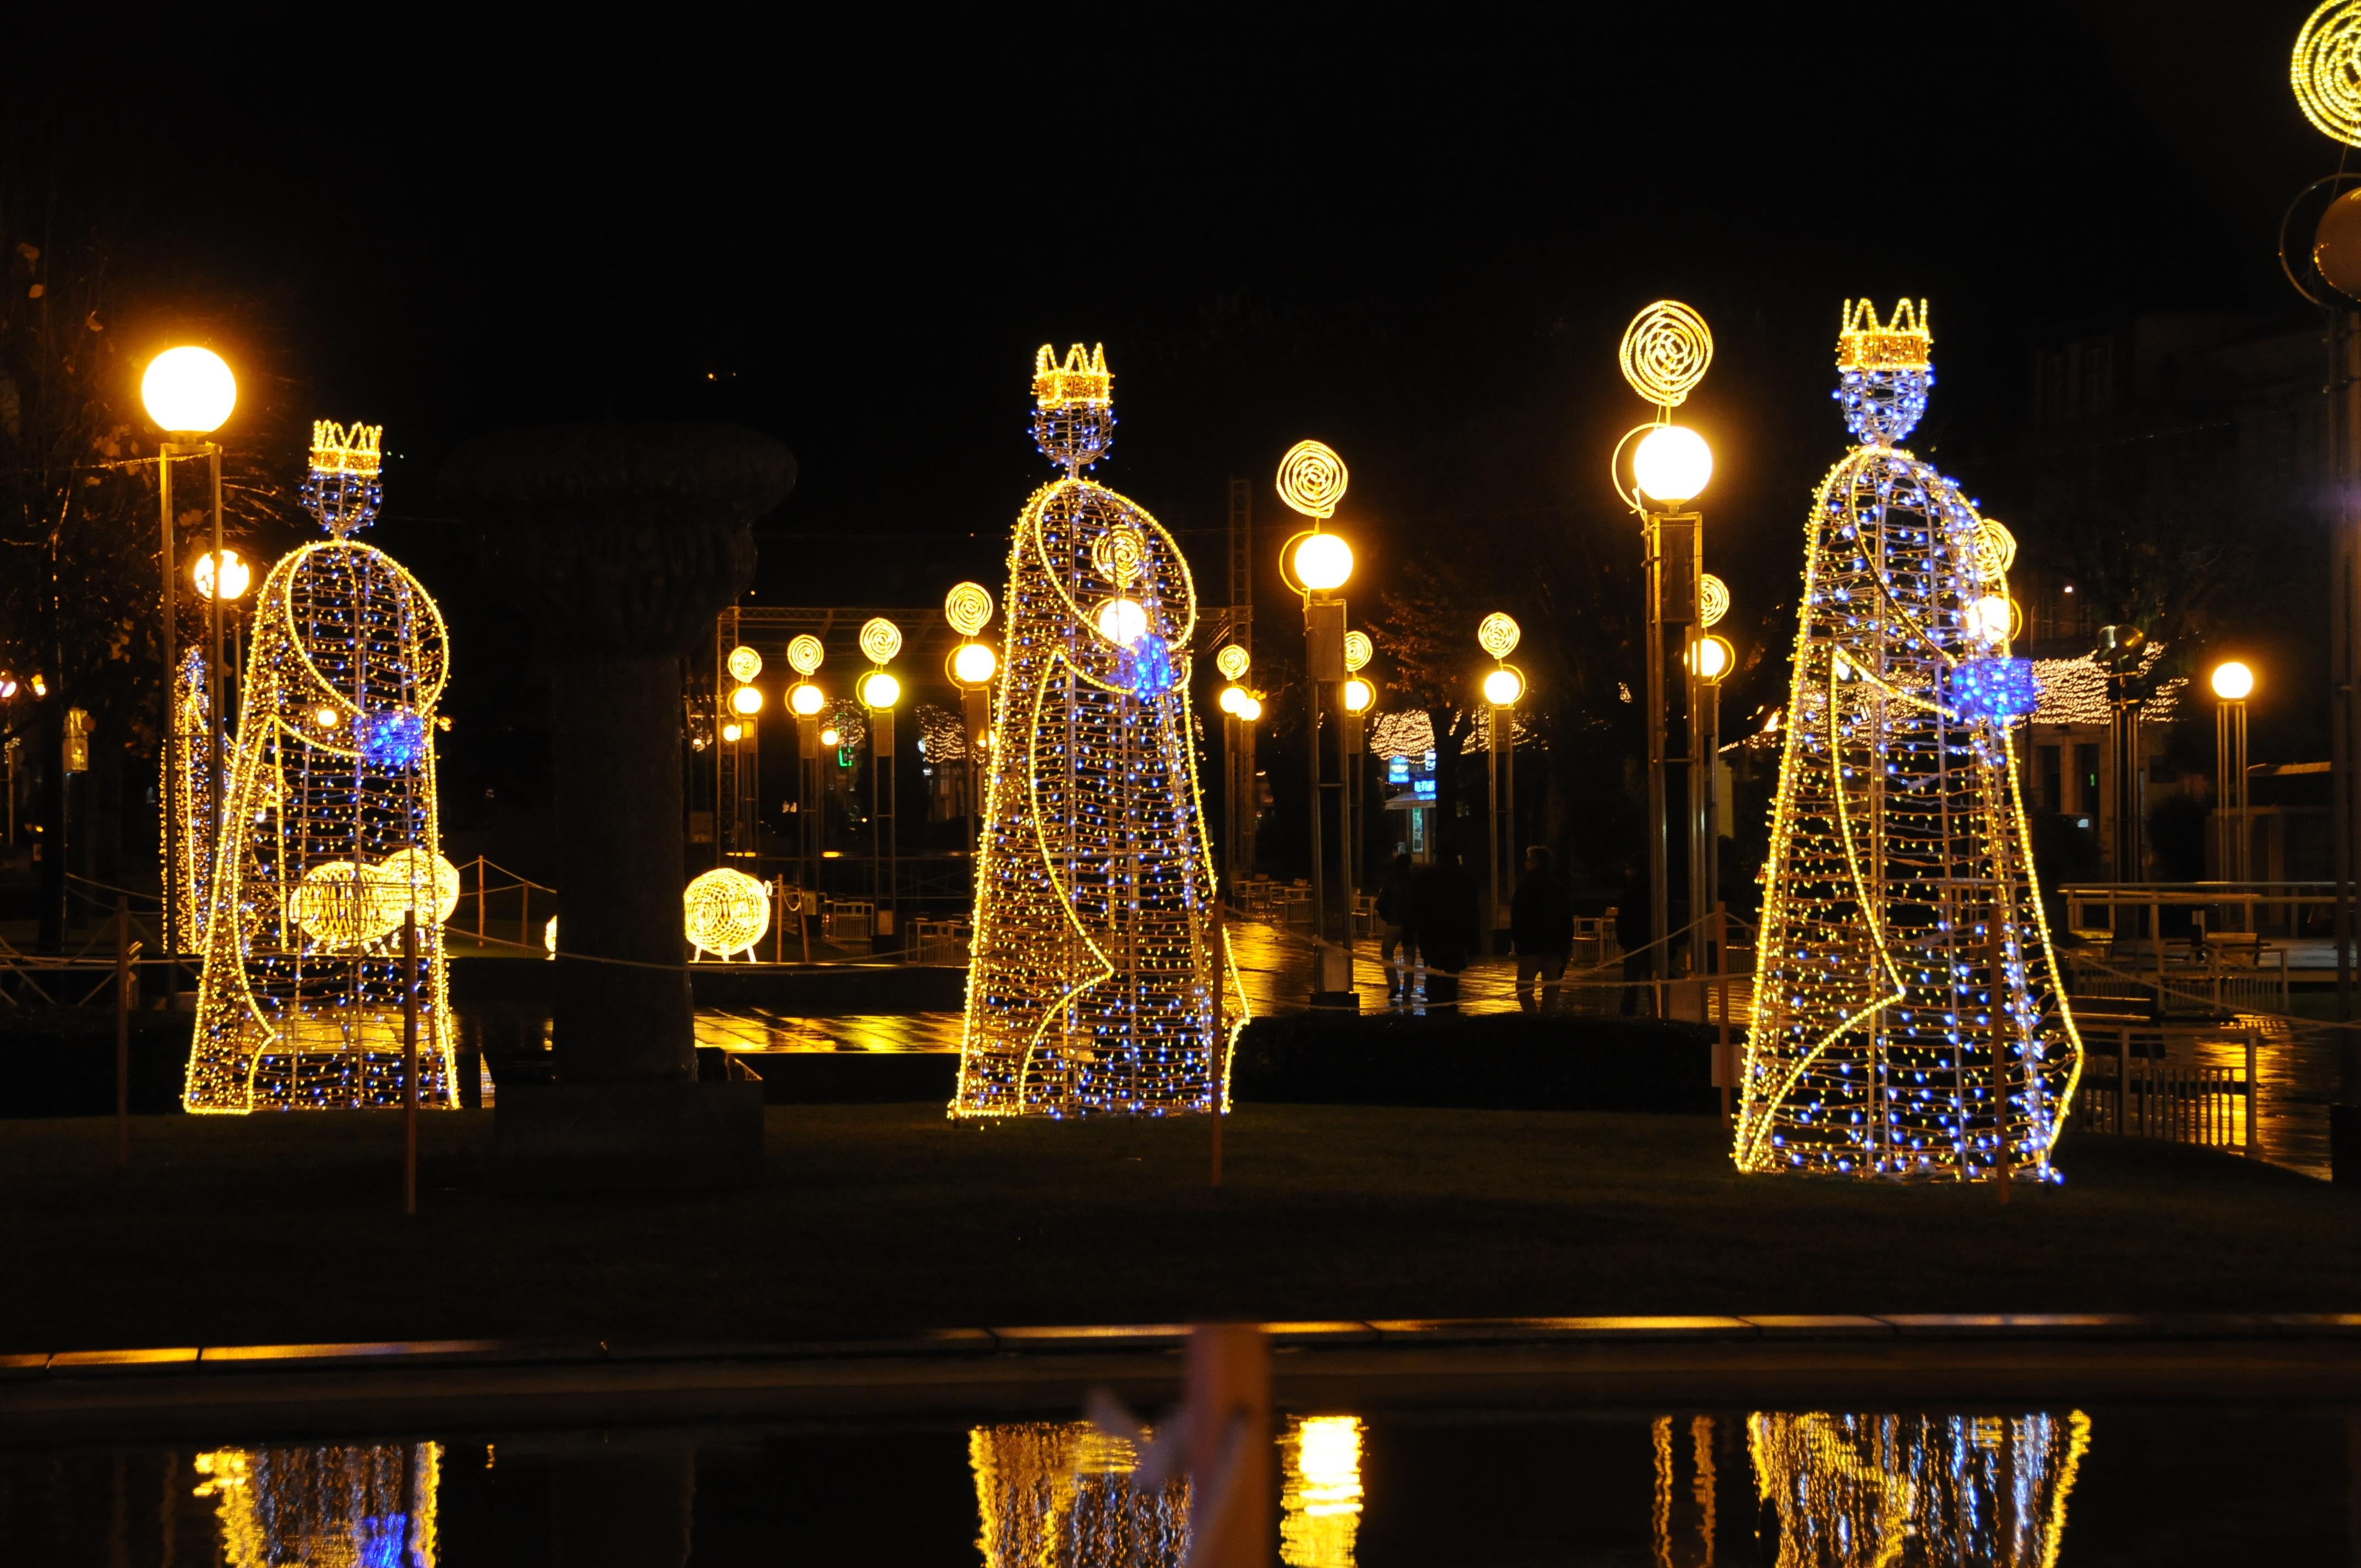 FileChristmas Decorations In Braga 6JPG Wikimedia Commons